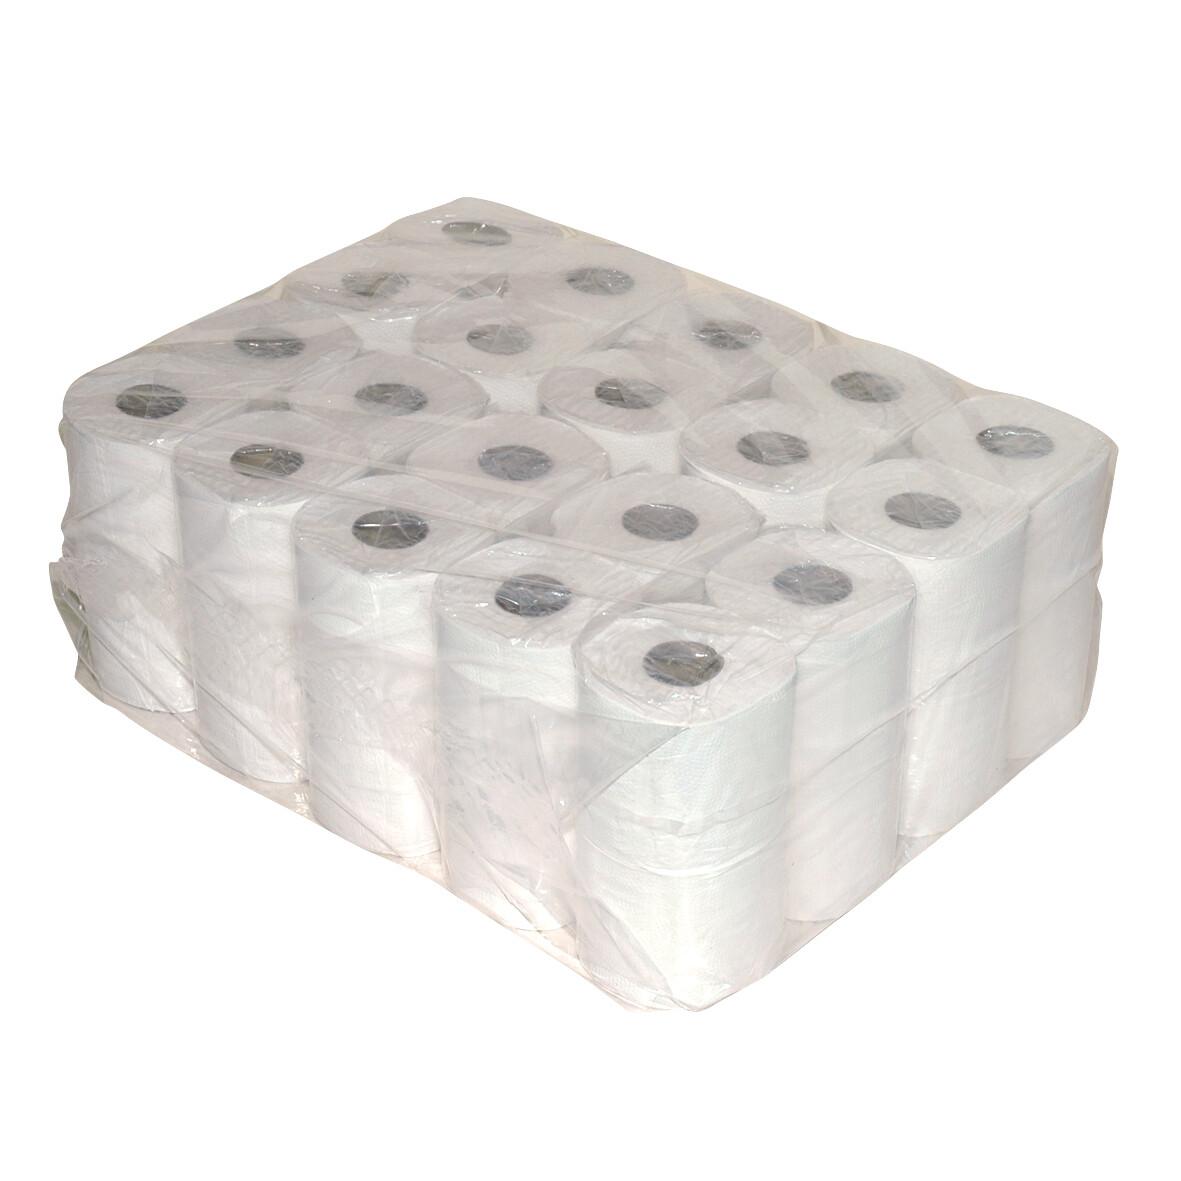 238240 Euro tissue gerecycled 2-laags toiletpapier, pak van 40 rollen